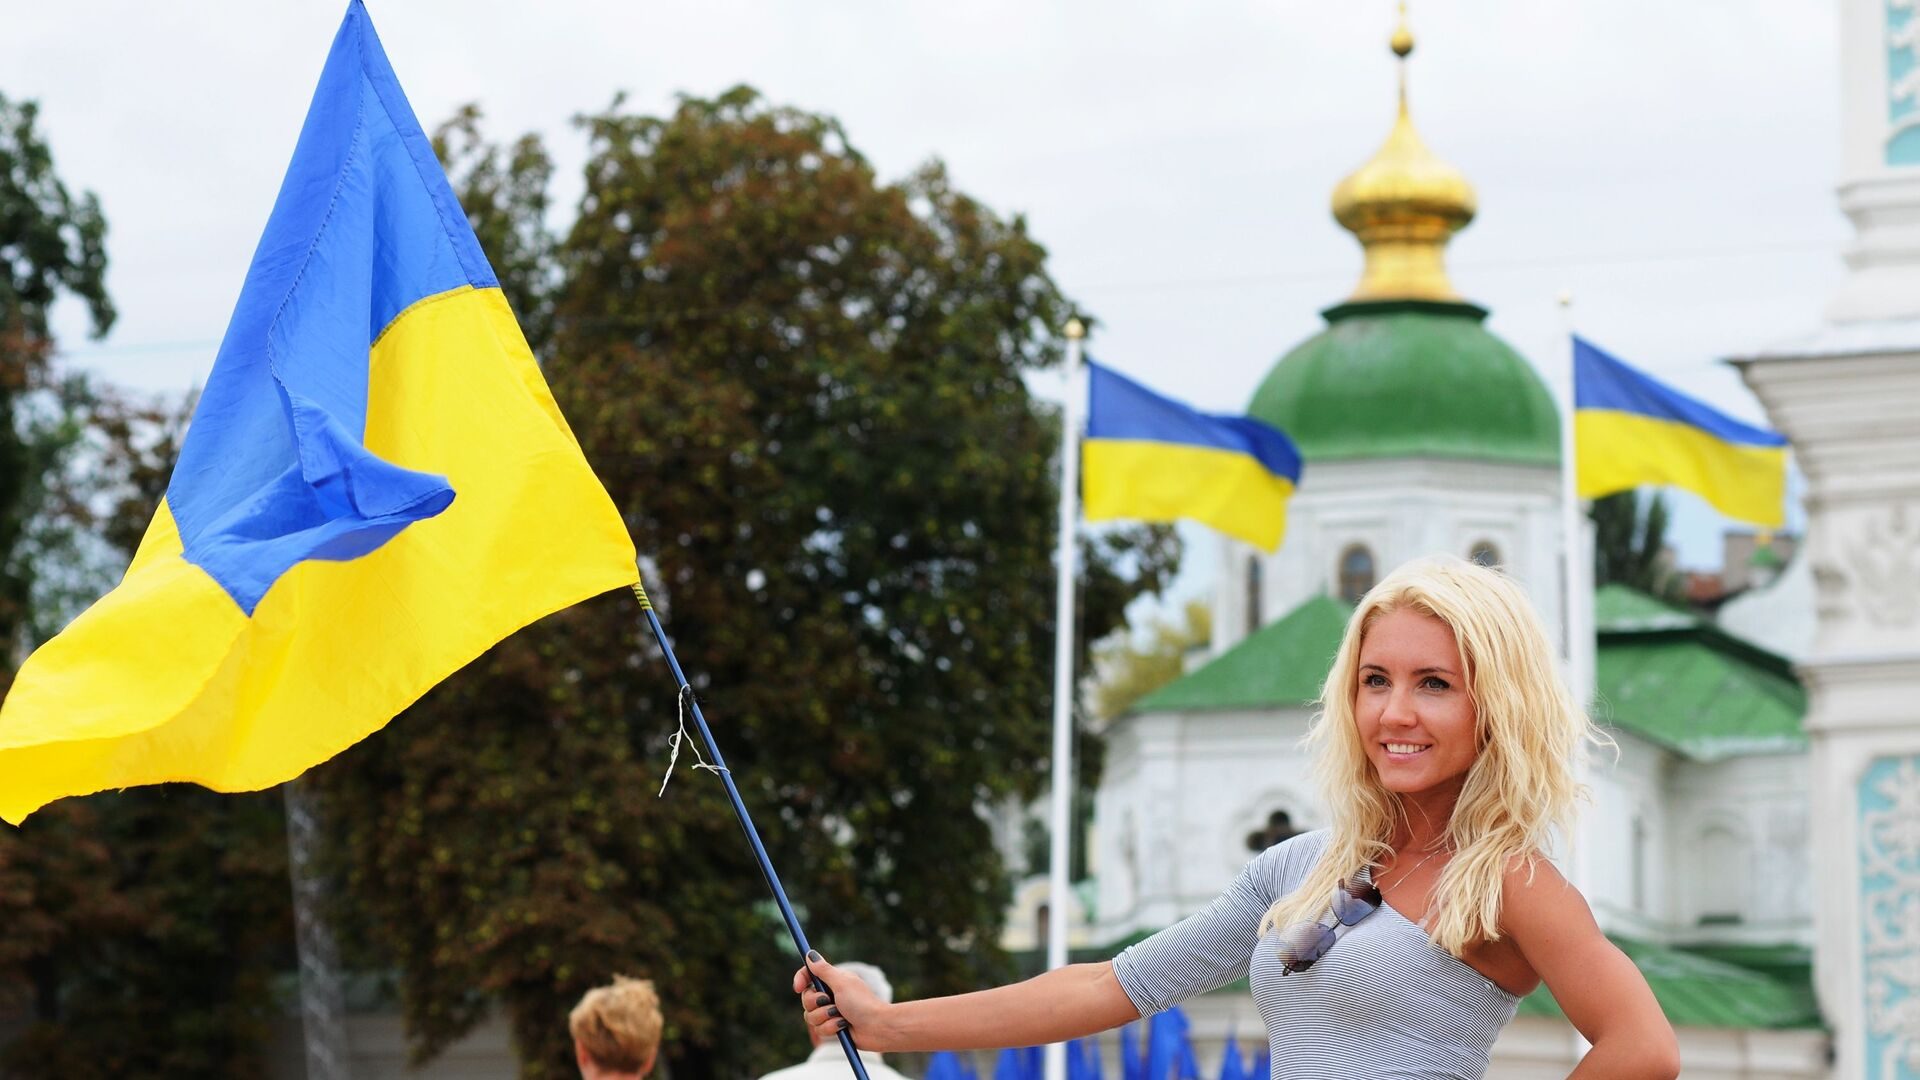 Девушка с украинским флагом - Sputnik Латвия, 1920, 29.07.2021